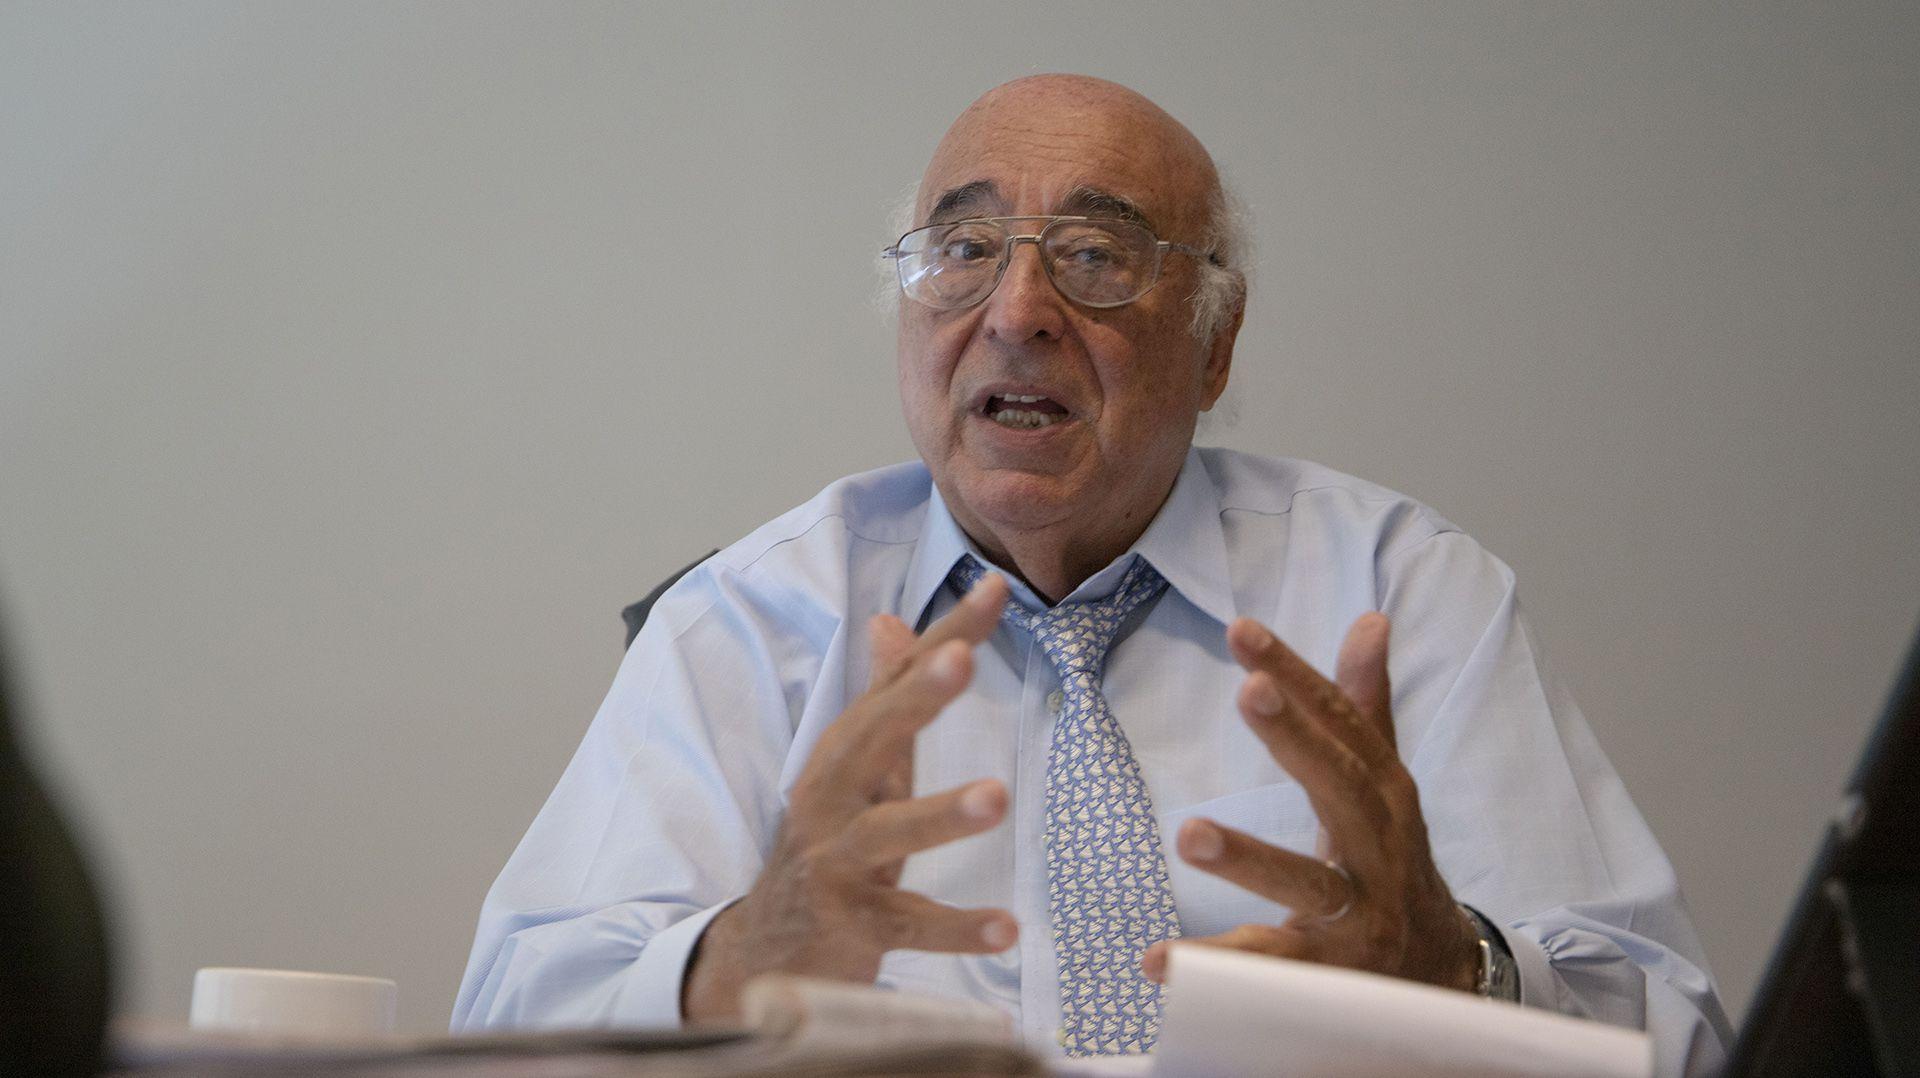 Miguel Ángel Broda, economista